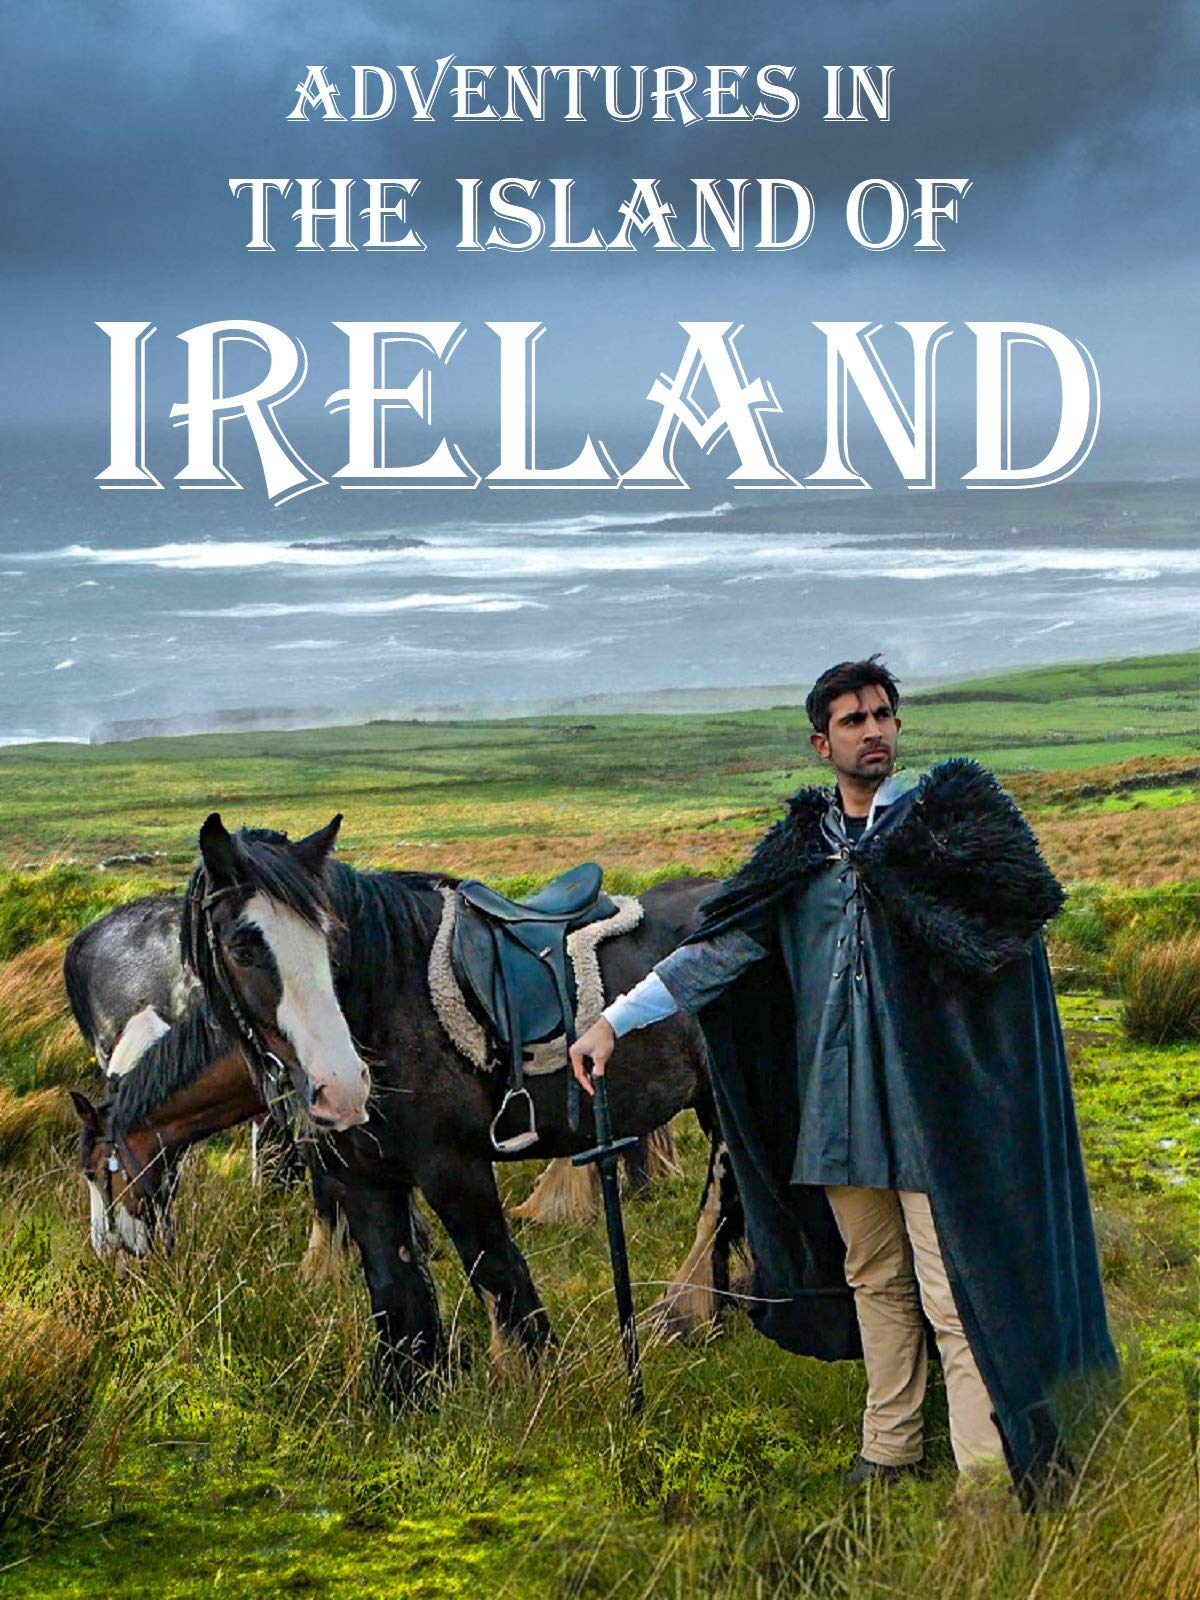 Adventures in the Island of Ireland